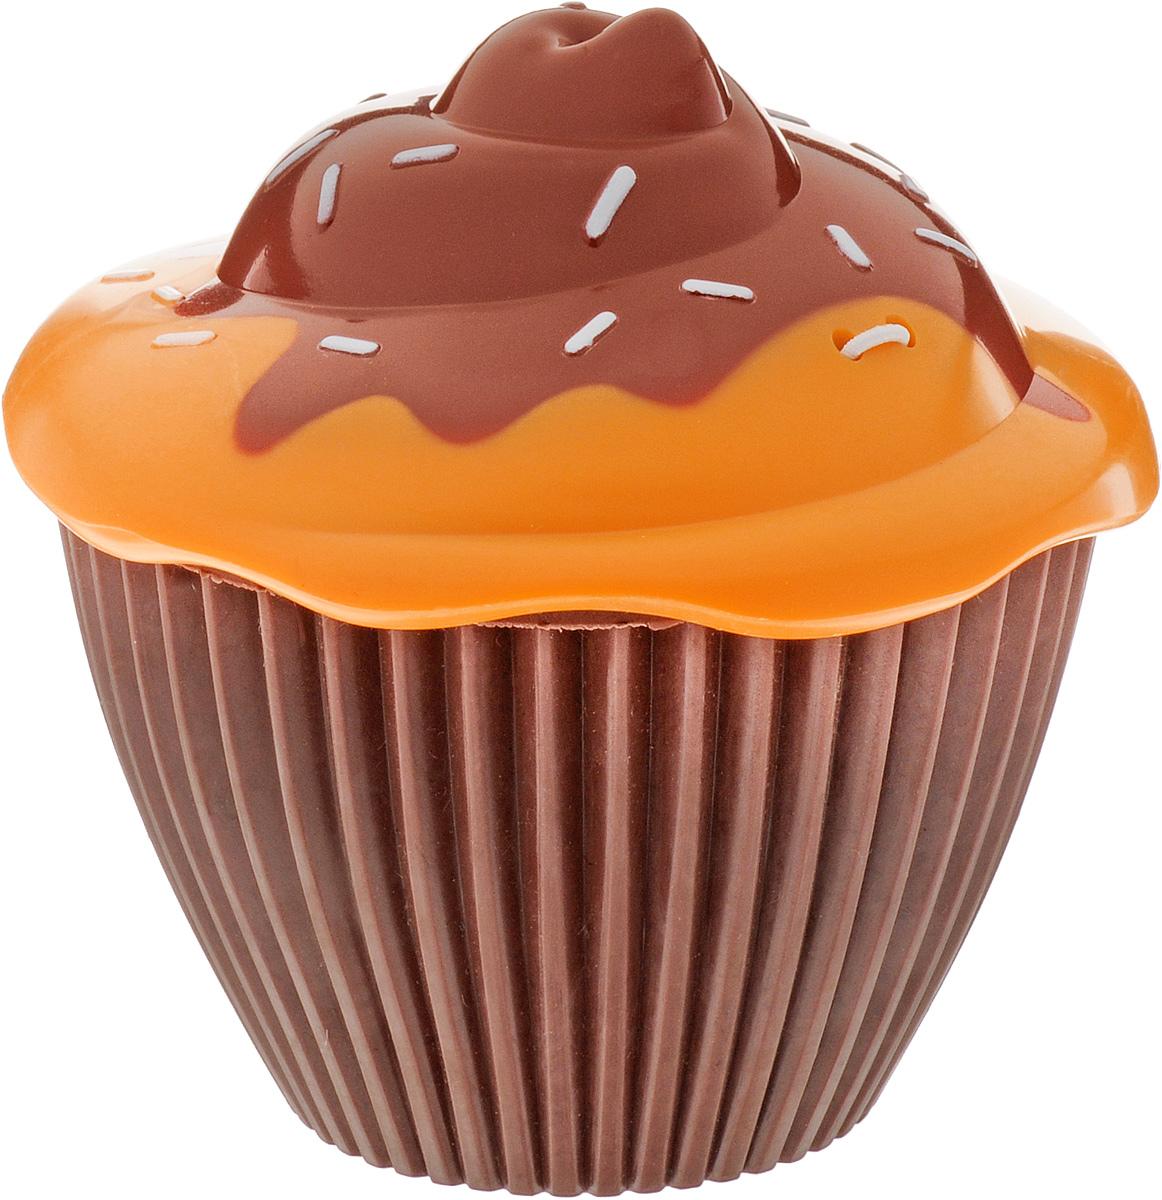 PlayMind Мини-кукла Coco Orange цвет коричневый оранжевый39185B_коричневый, оранжевый